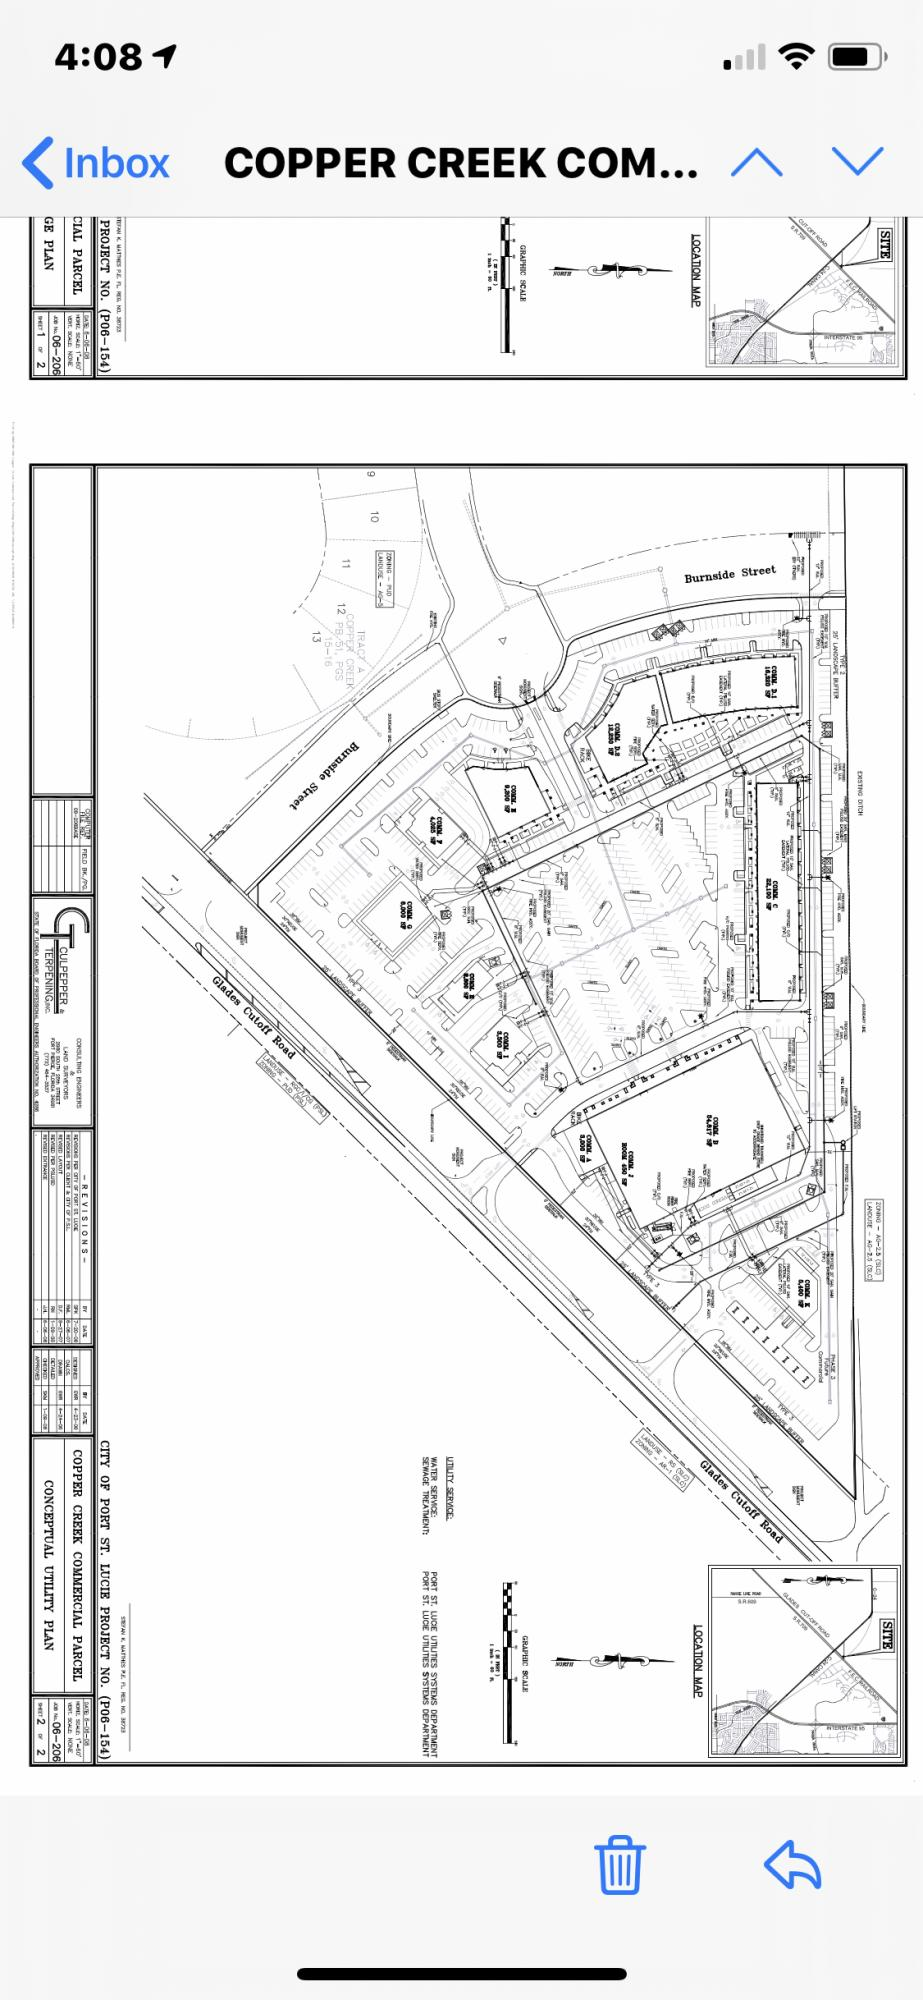 11552 Glades Cut Off Road, Port Saint Lucie, Florida 34986, ,Land,For Sale,COPPER CREEK,Glades Cut Off,RX-10483968